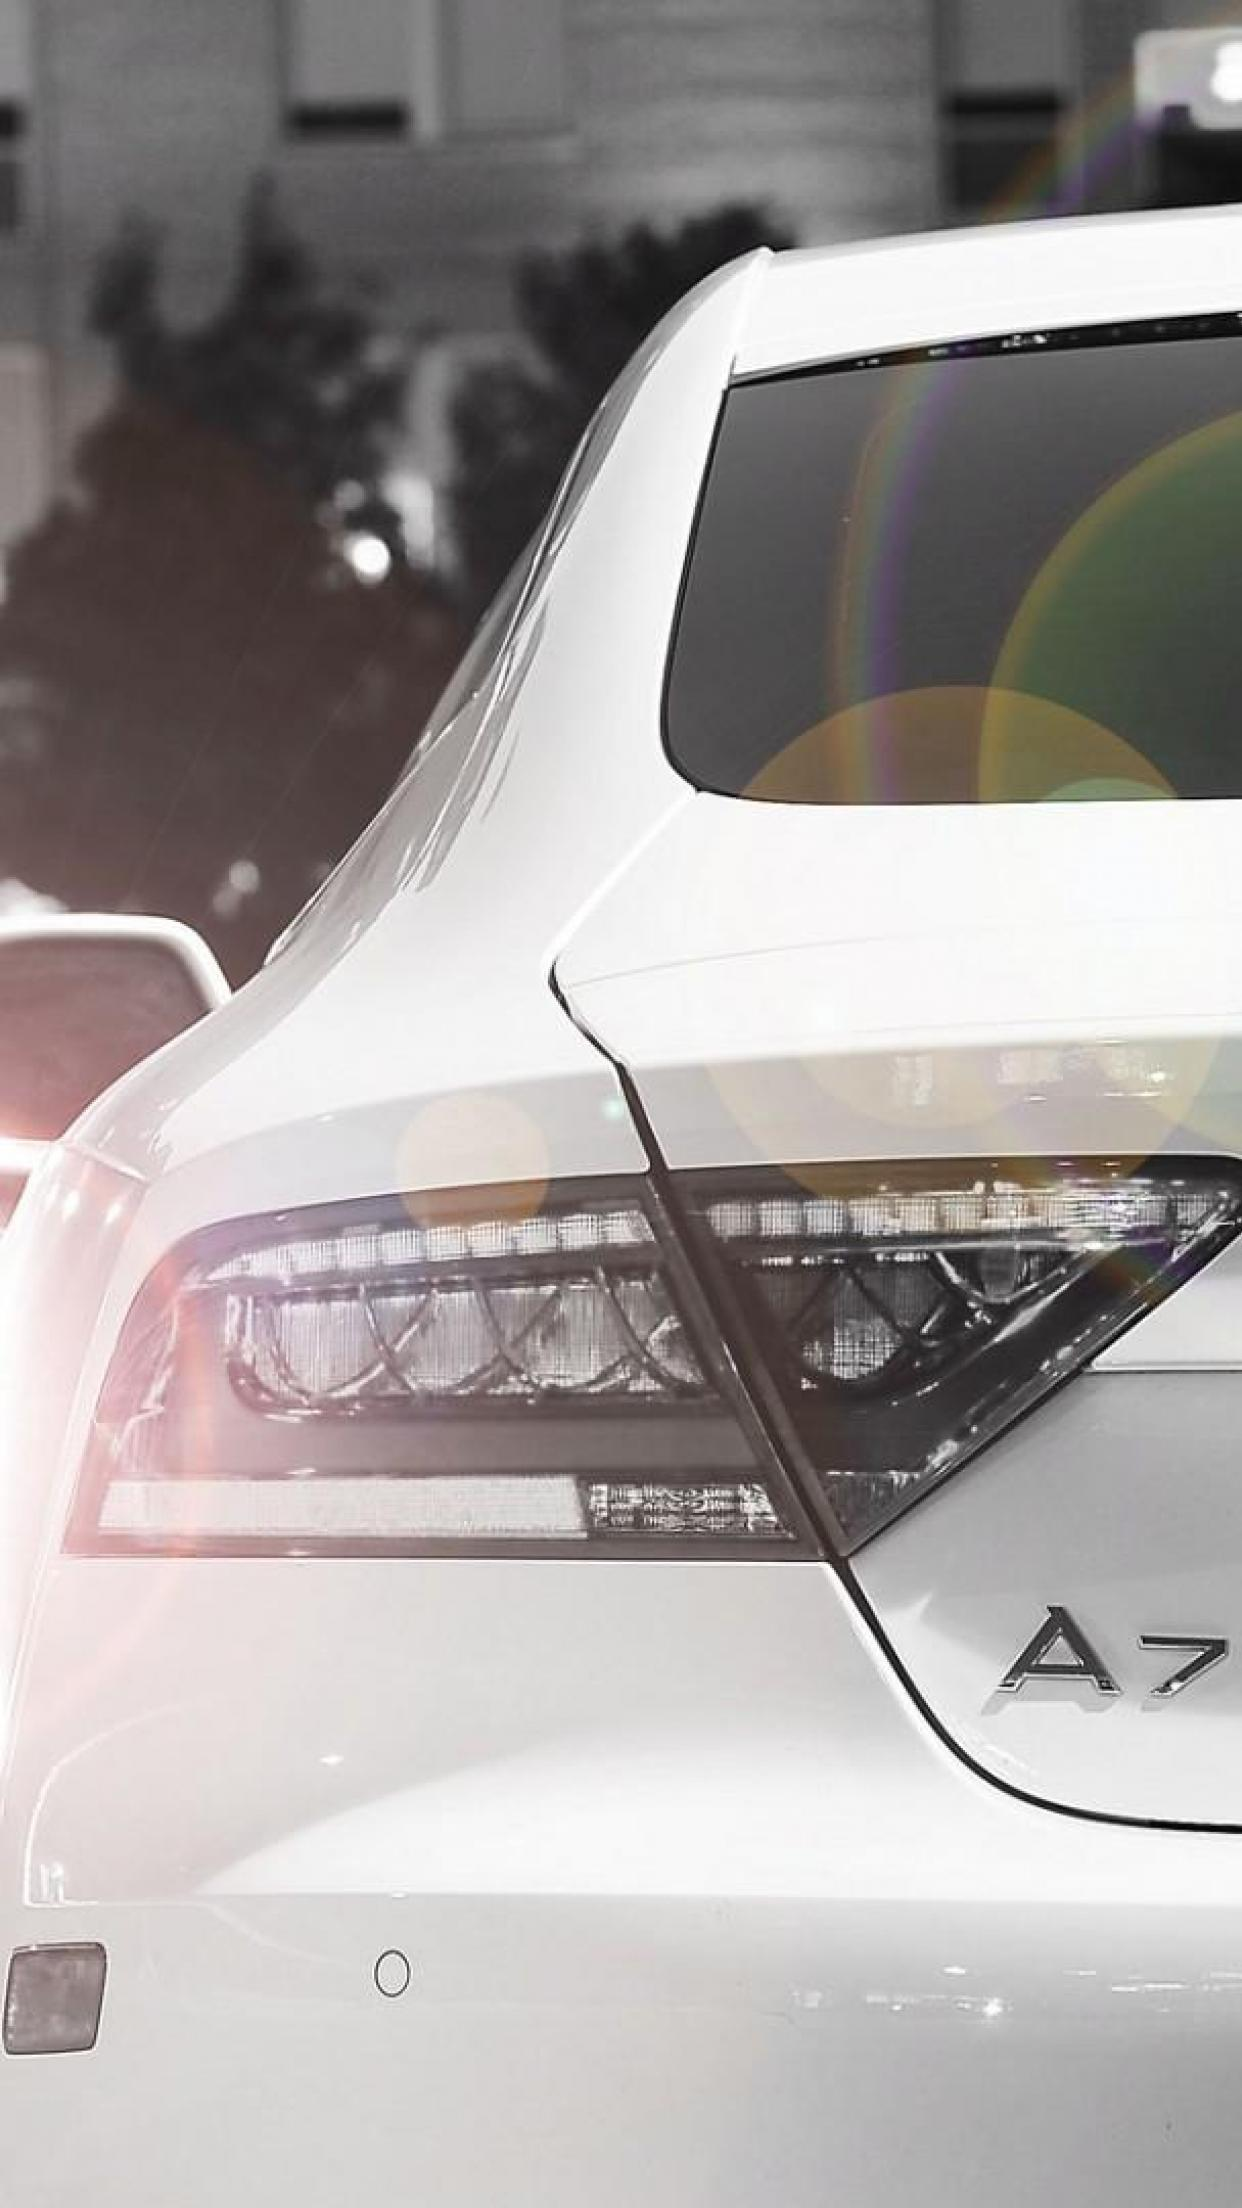 Audi A7 - Audi A7 Iphone 6 , HD Wallpaper & Backgrounds